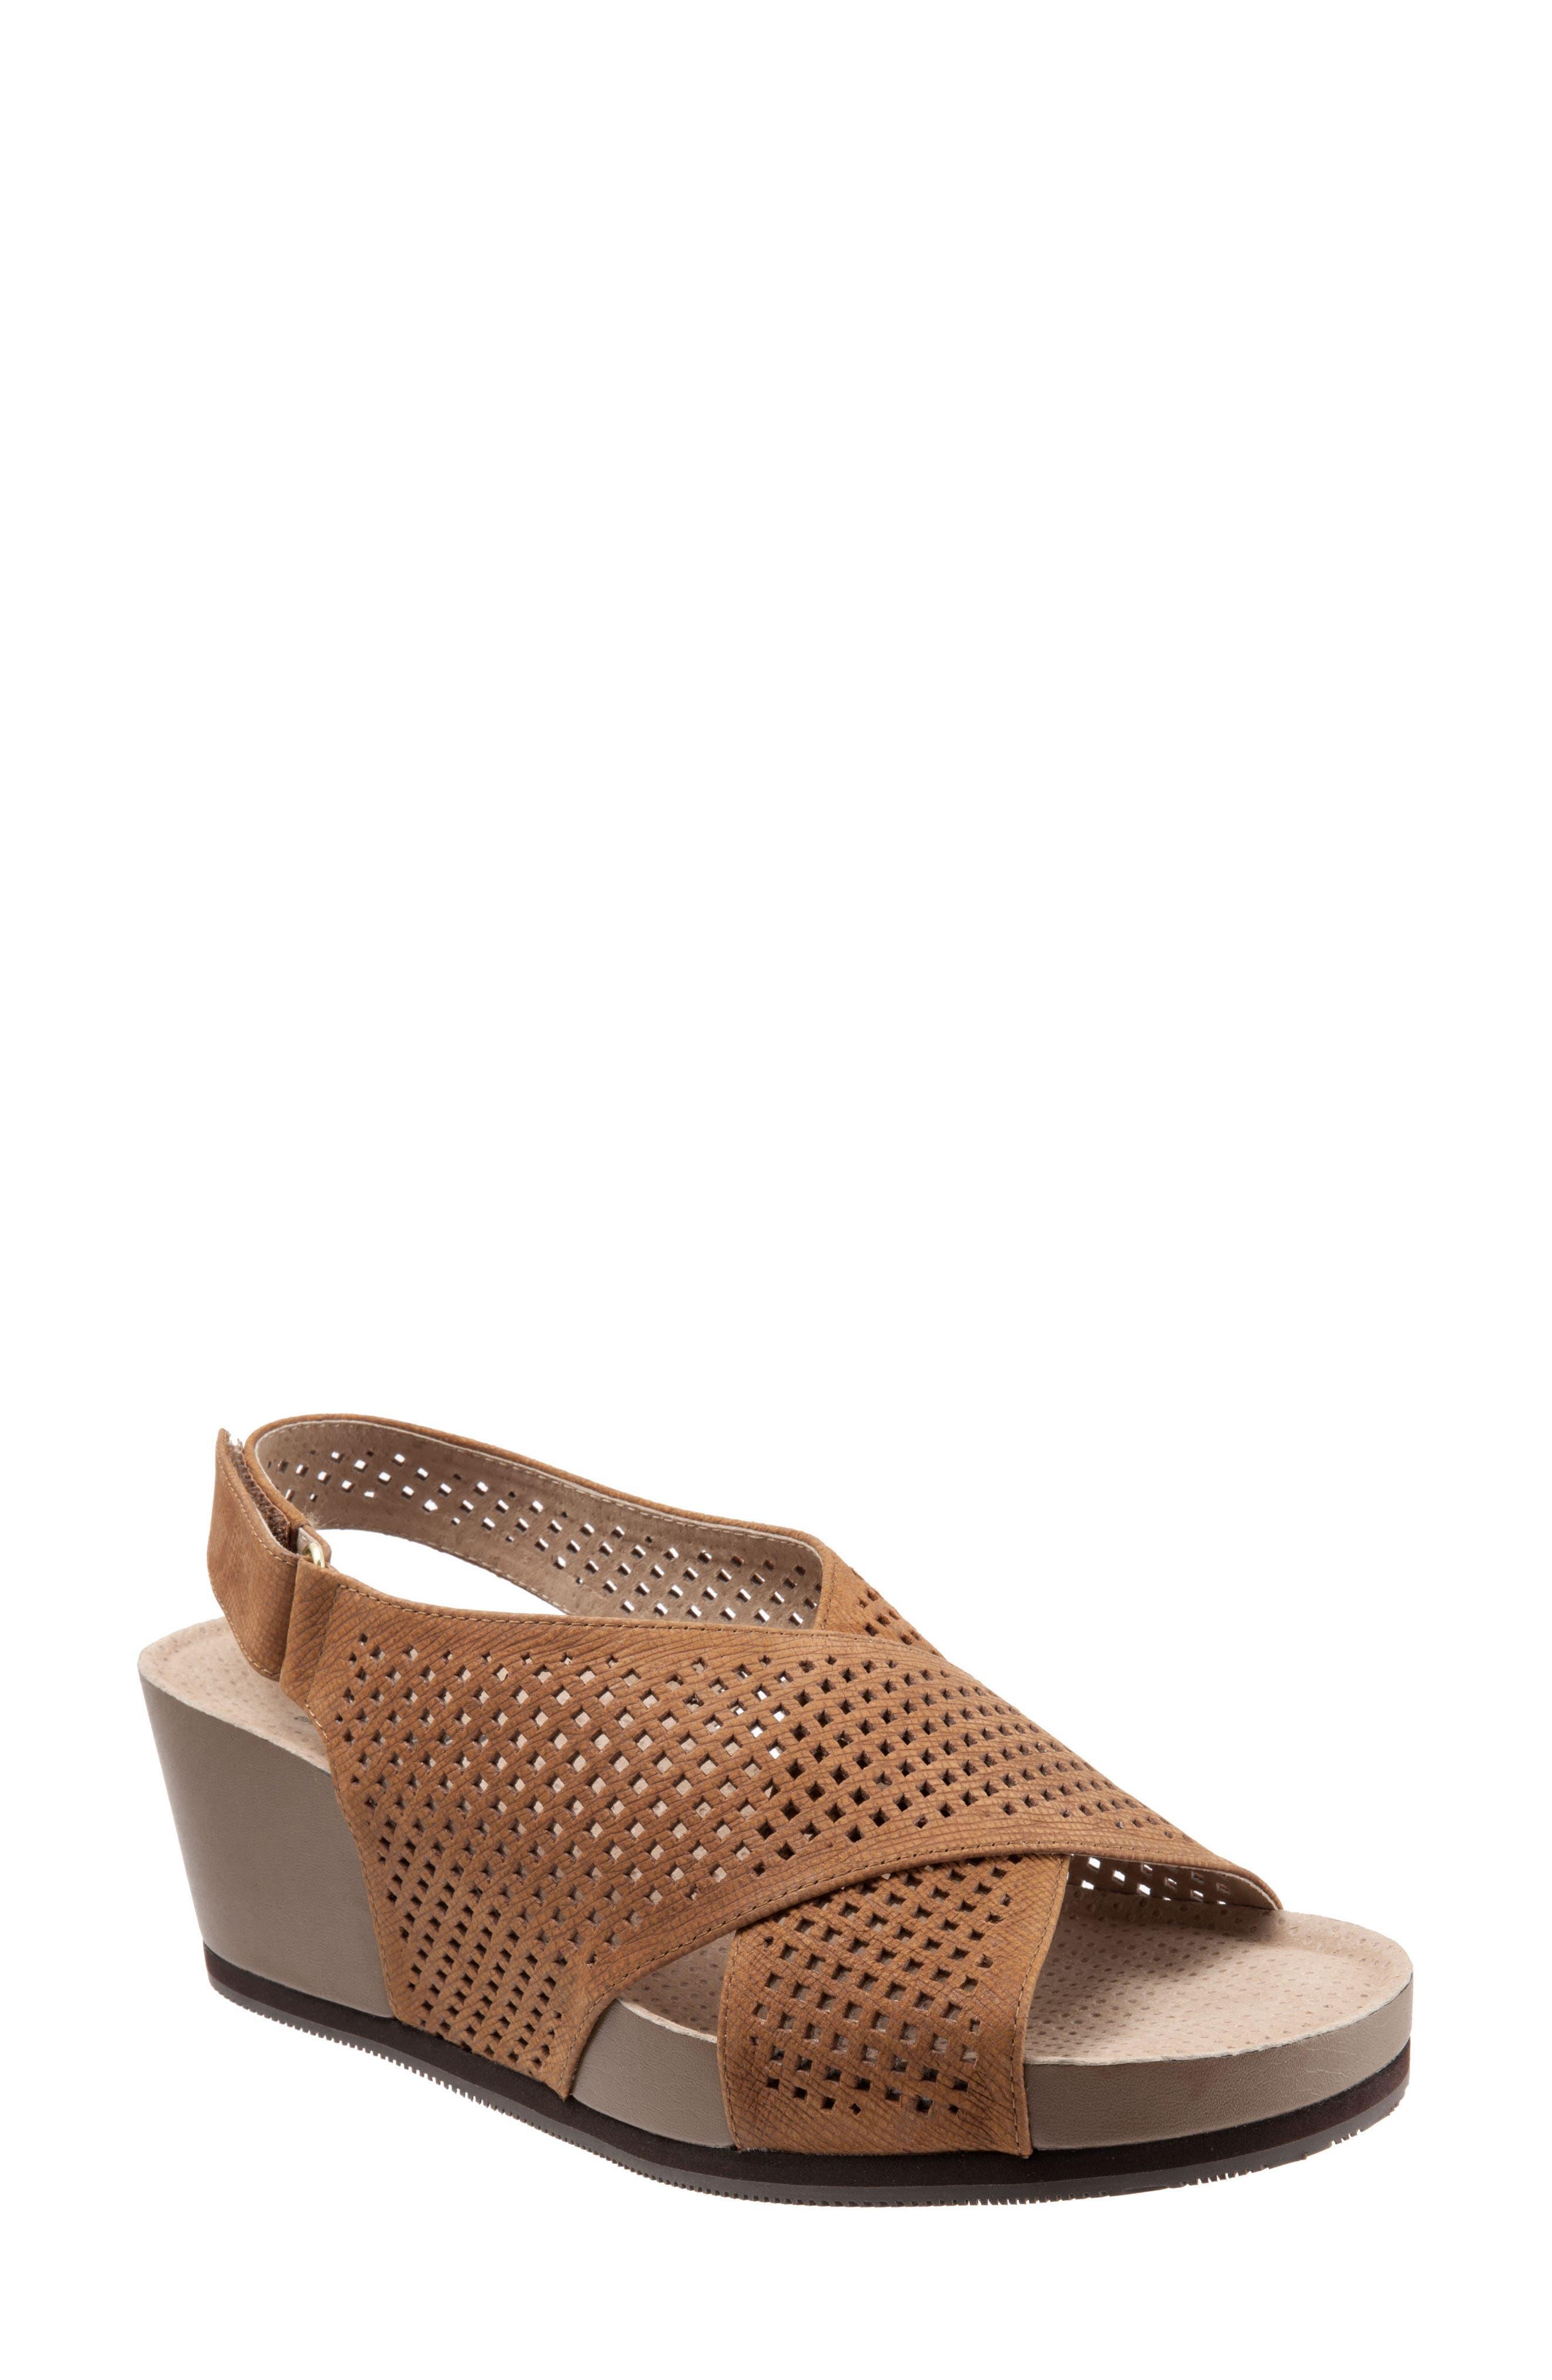 Main Image - SoftWalk® Hansford Wedge Sandal (Women)